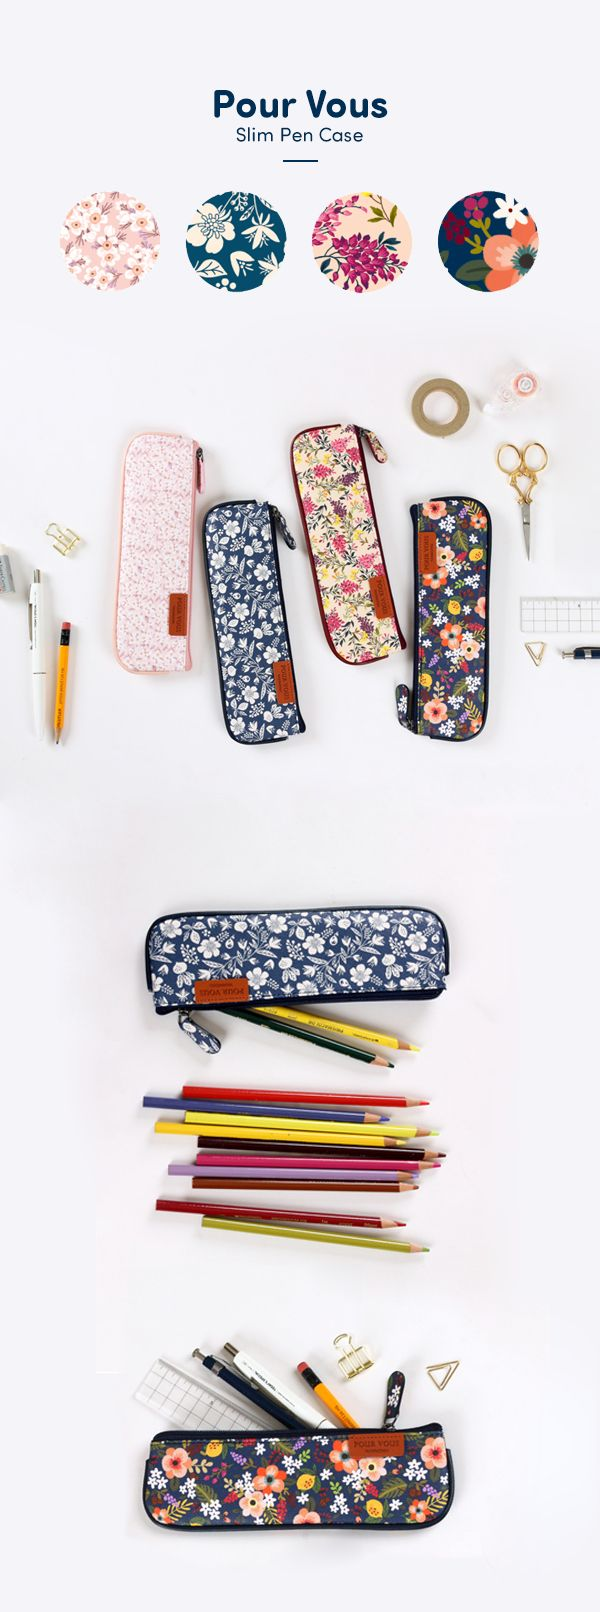 So cute! Give your favorite pens and pencils a little special treatment with this super slim Pour Vous Slim Pen Case!